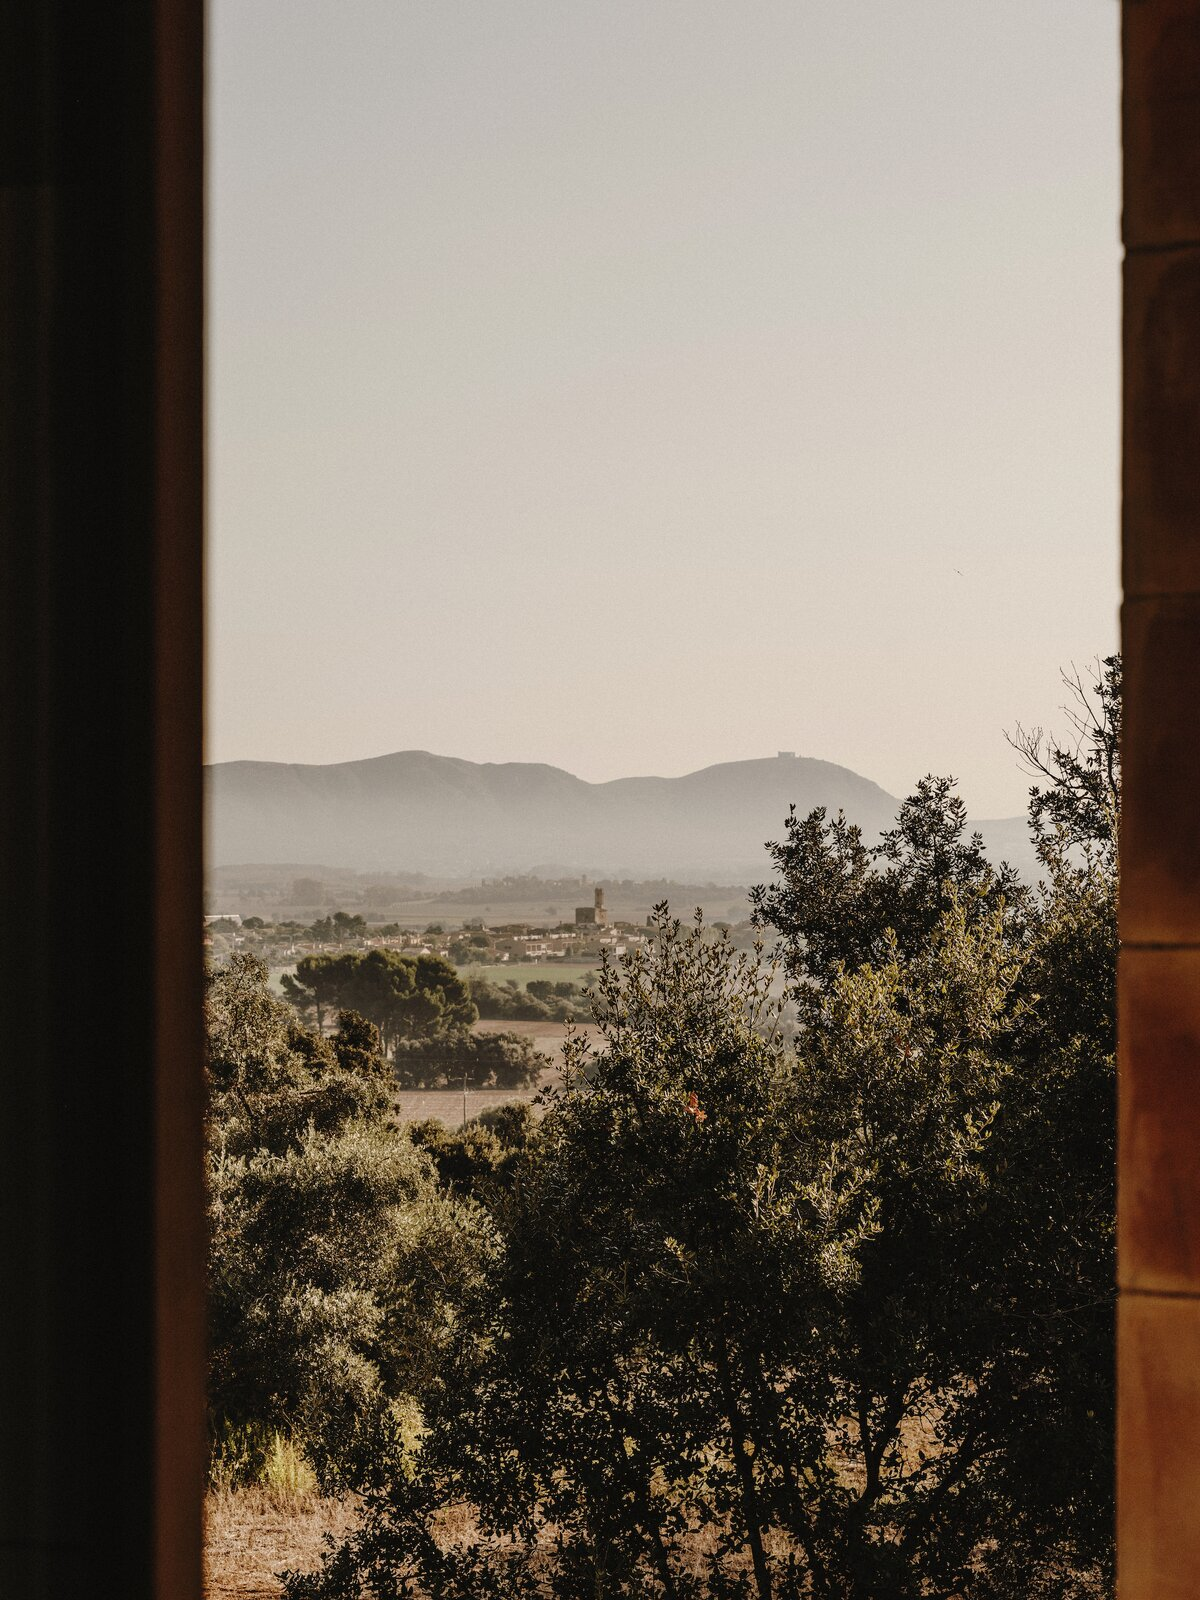 Window view of Casa Ter by Mesura.